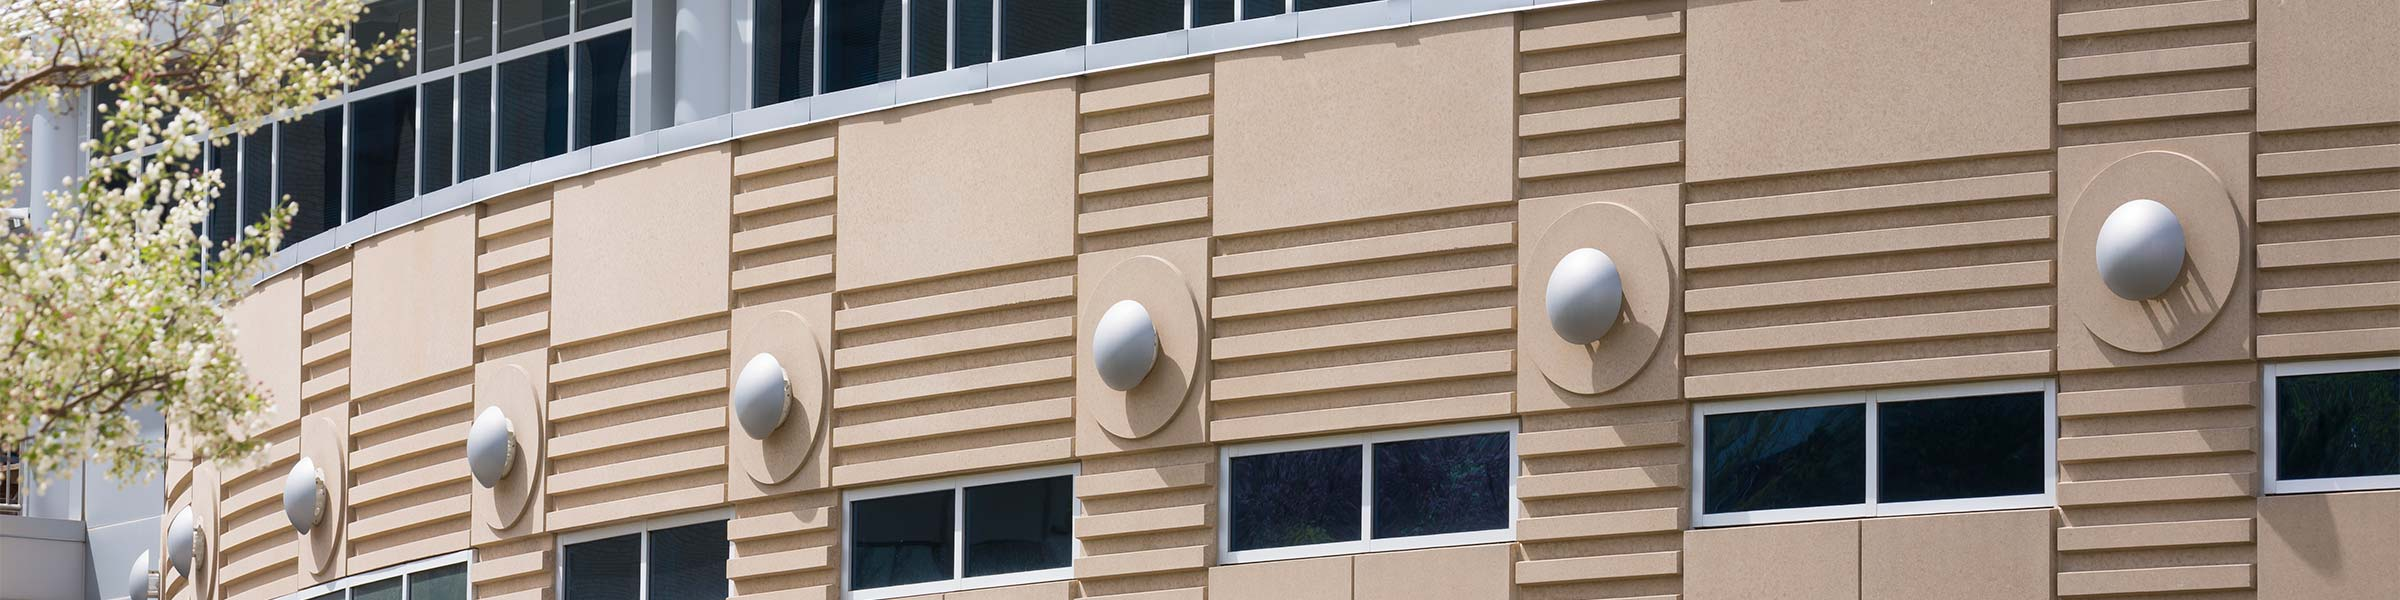 Hixson Lied Science Building on Creighton University Campus in Omaha, Nebraska